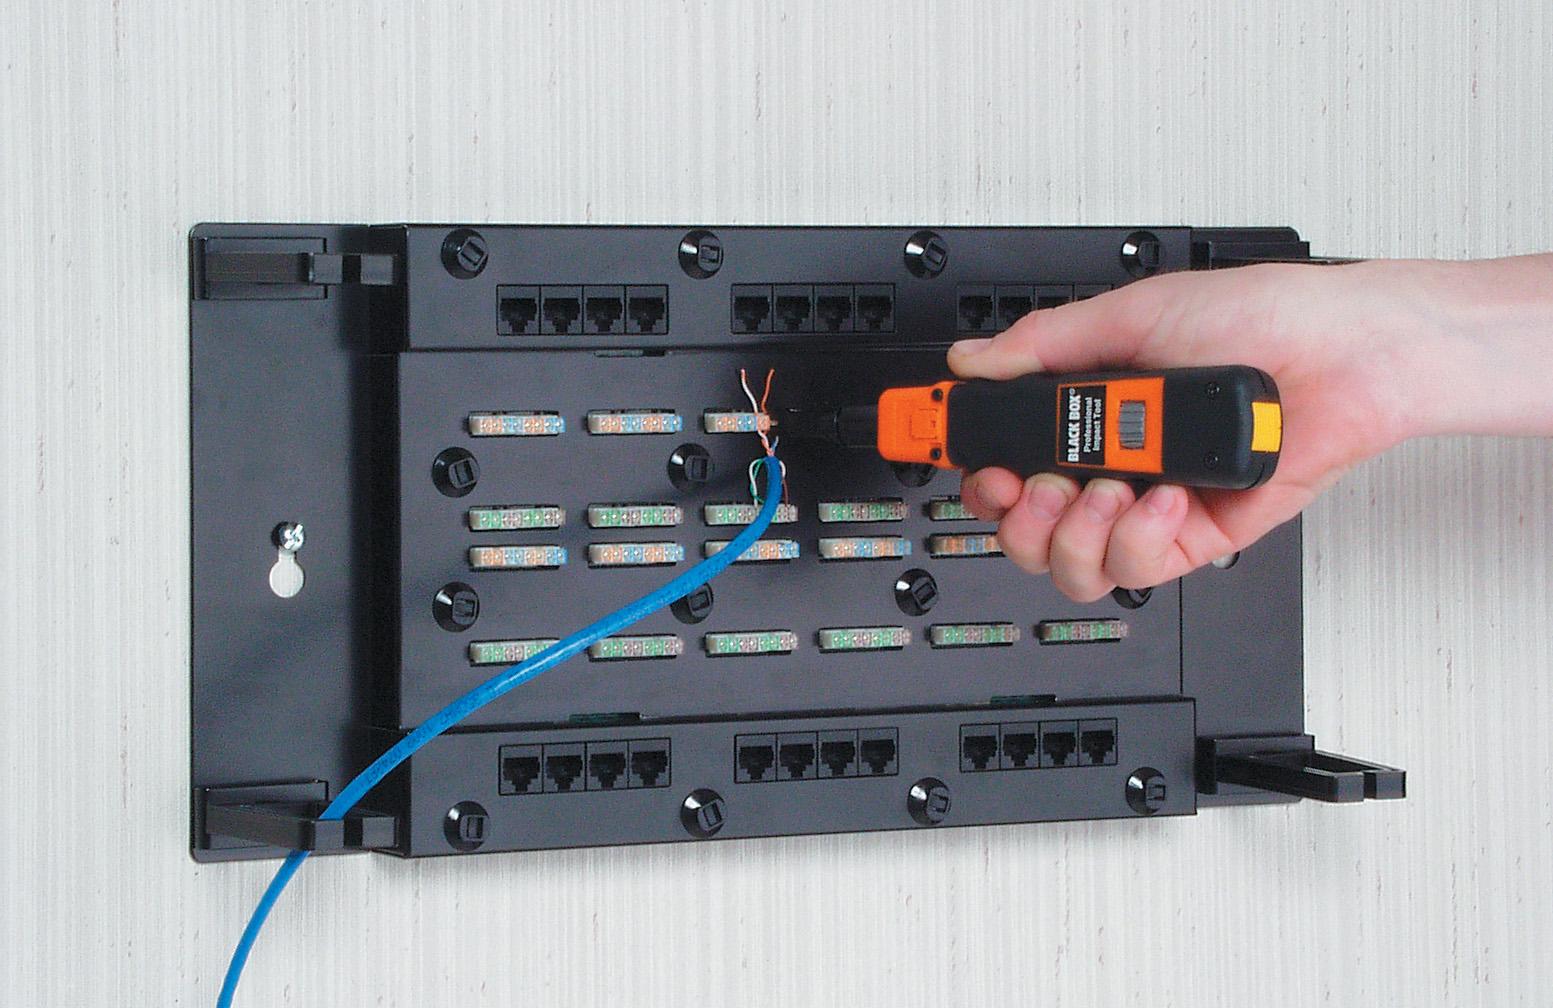 Attic Cat 5e Wiring Diagrams Cat5e Wallmount Patch Panel With Cover 24 Port Black Box Diagram Pdf